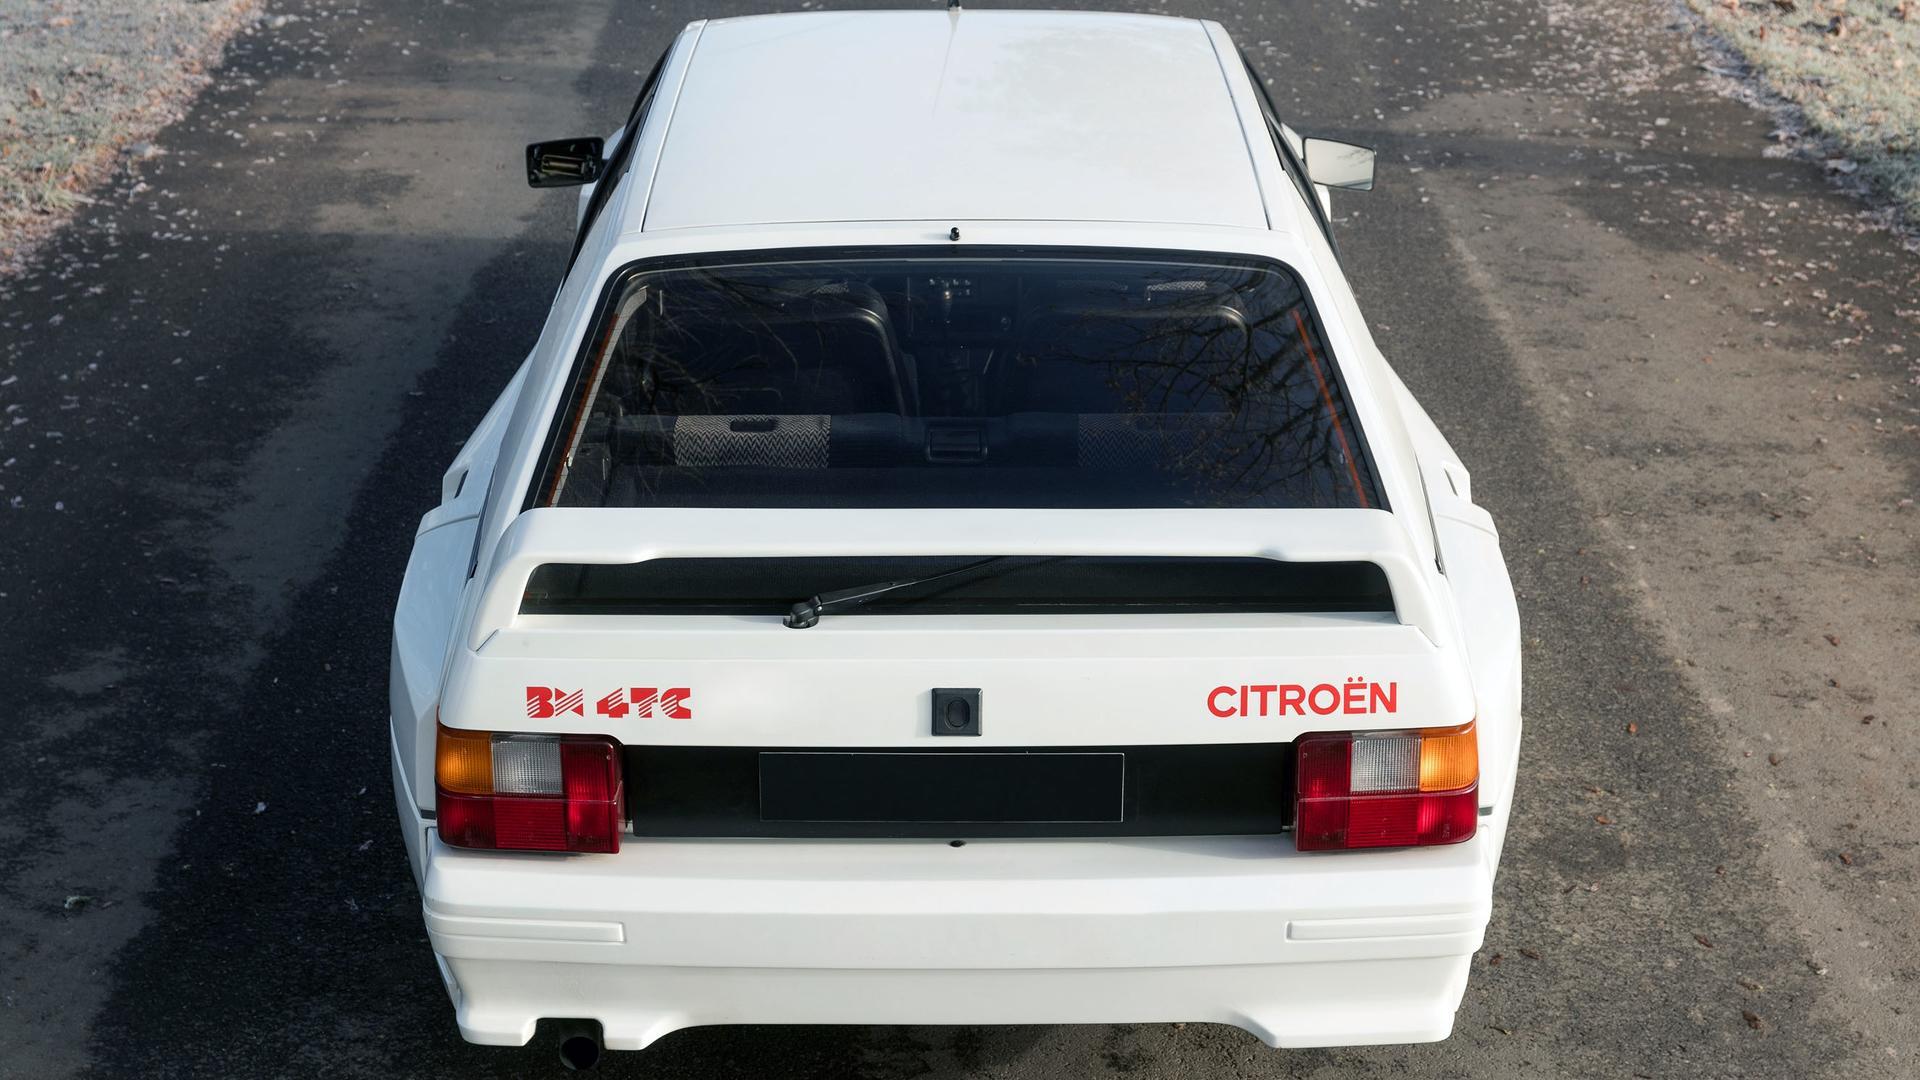 Citroën BX 4TC